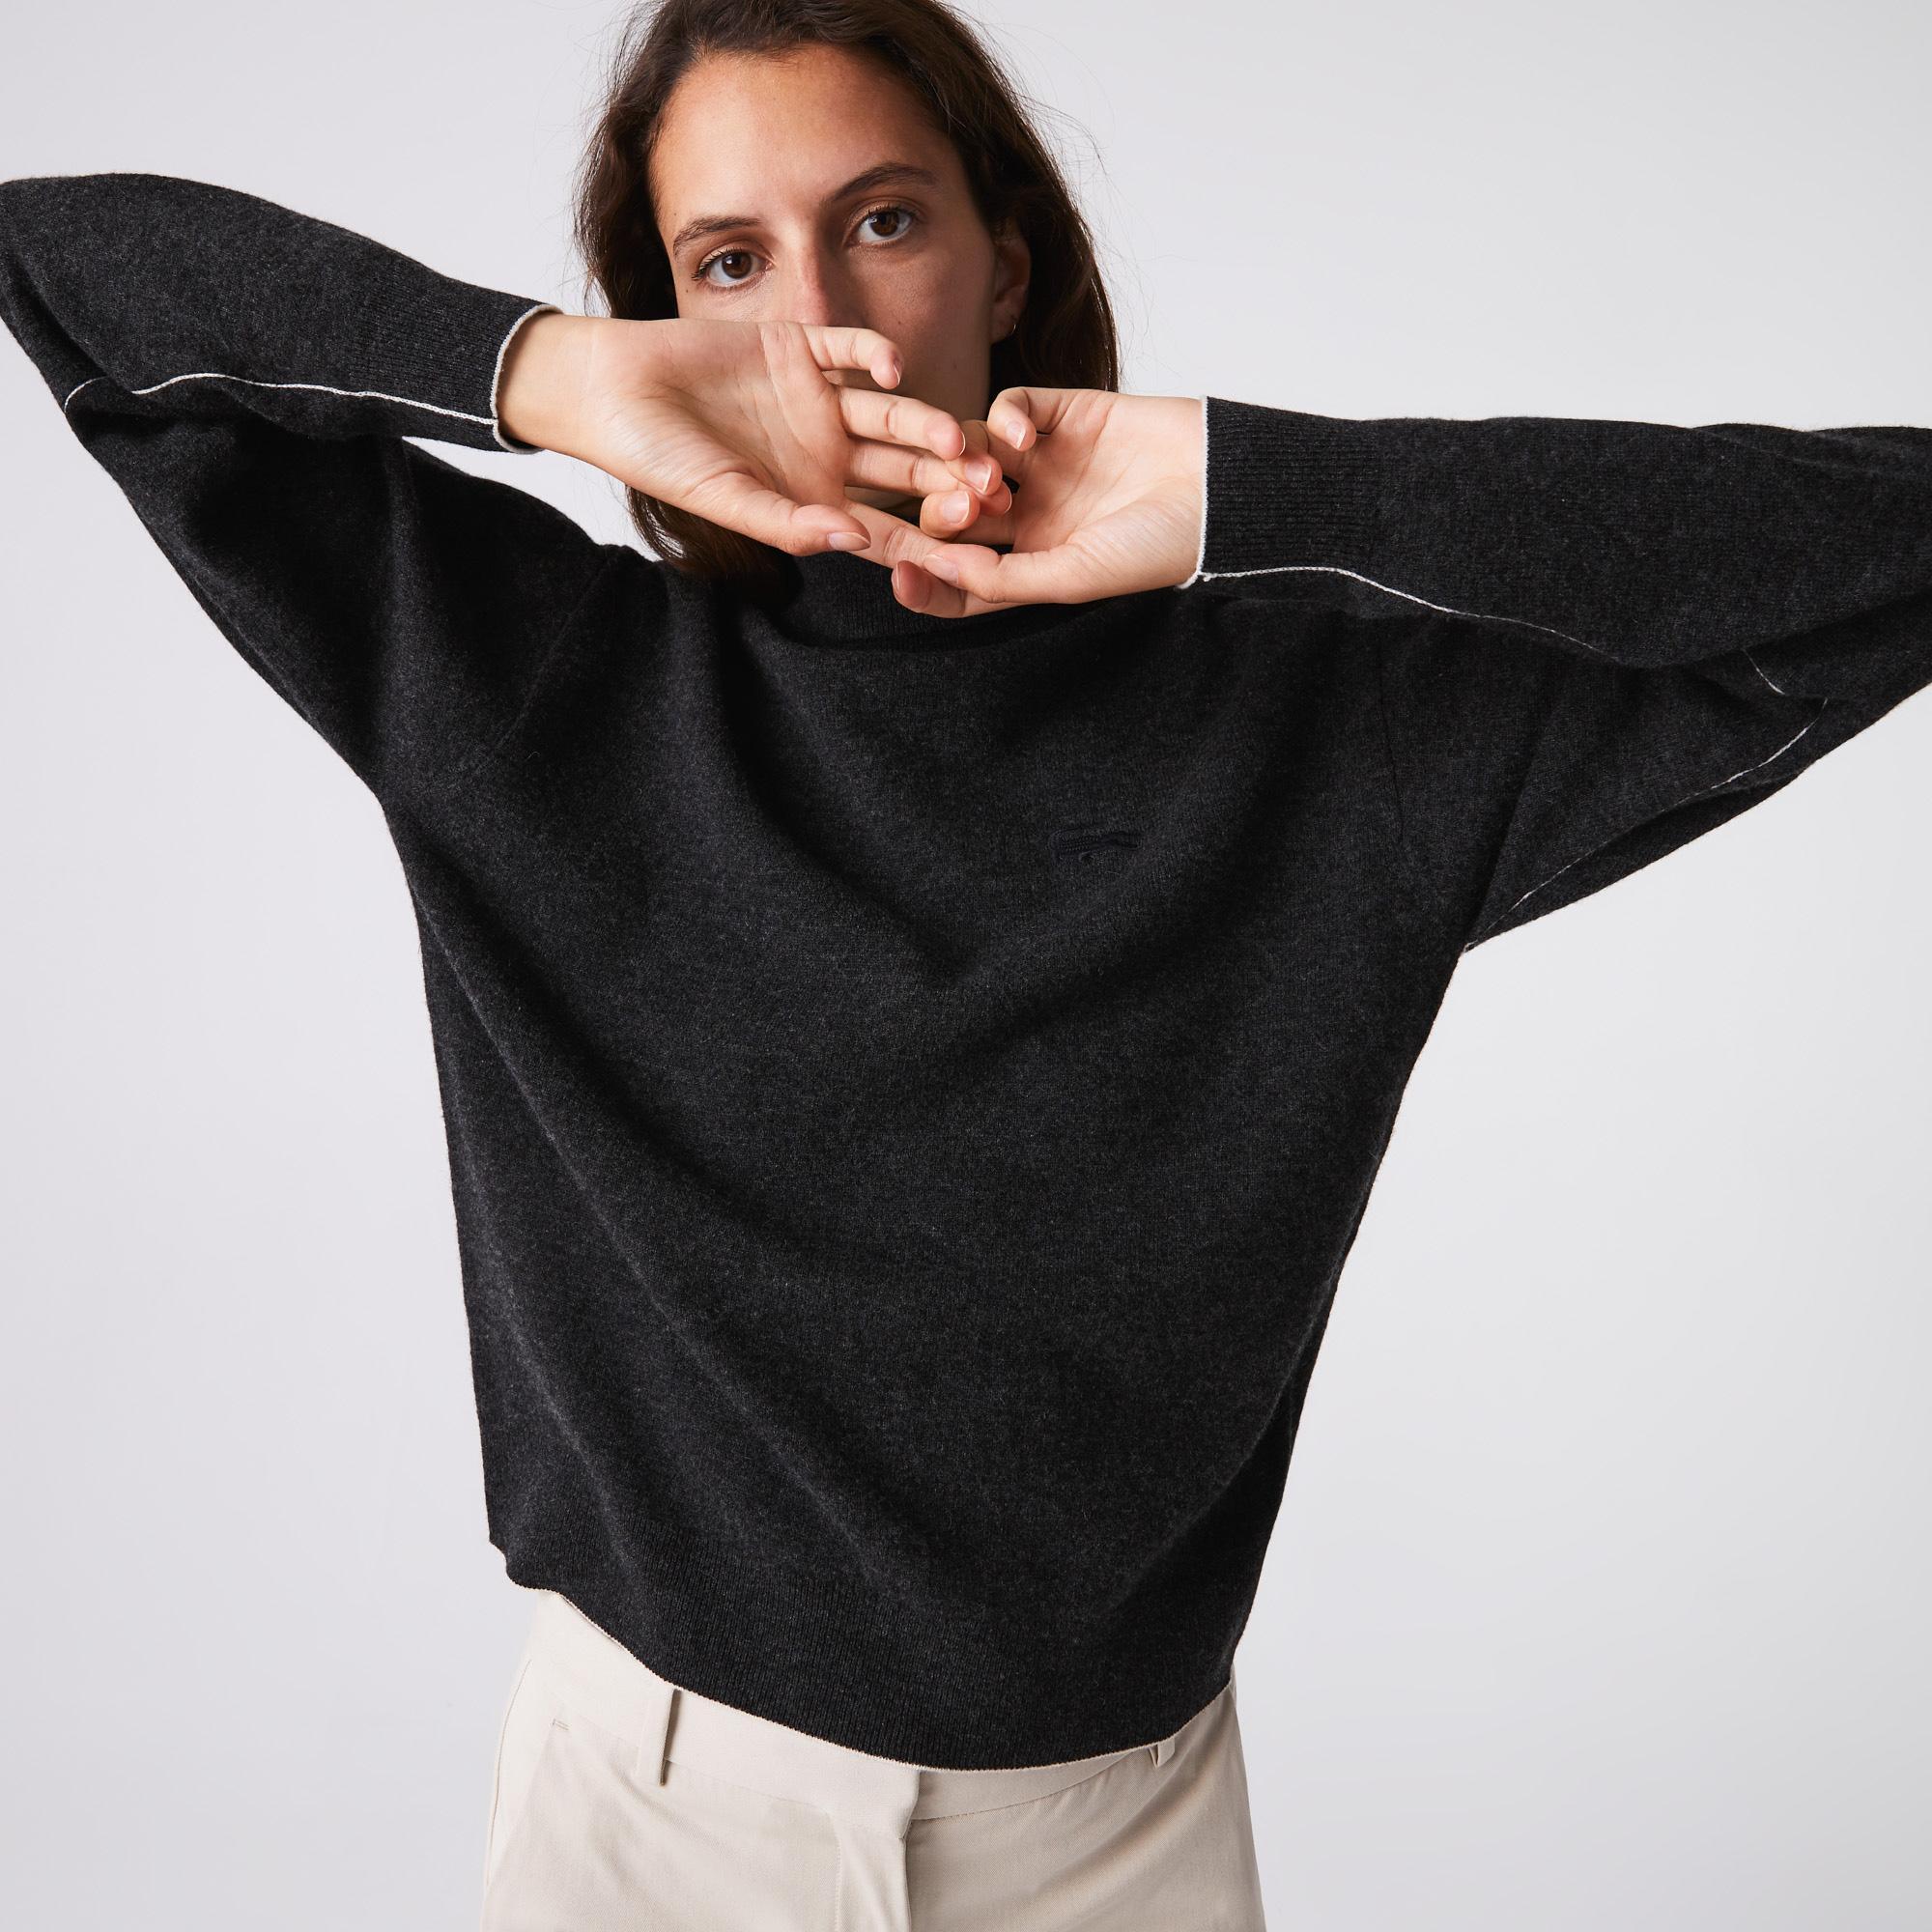 Lacoste Damski Wełniany Sweter Typu Golf